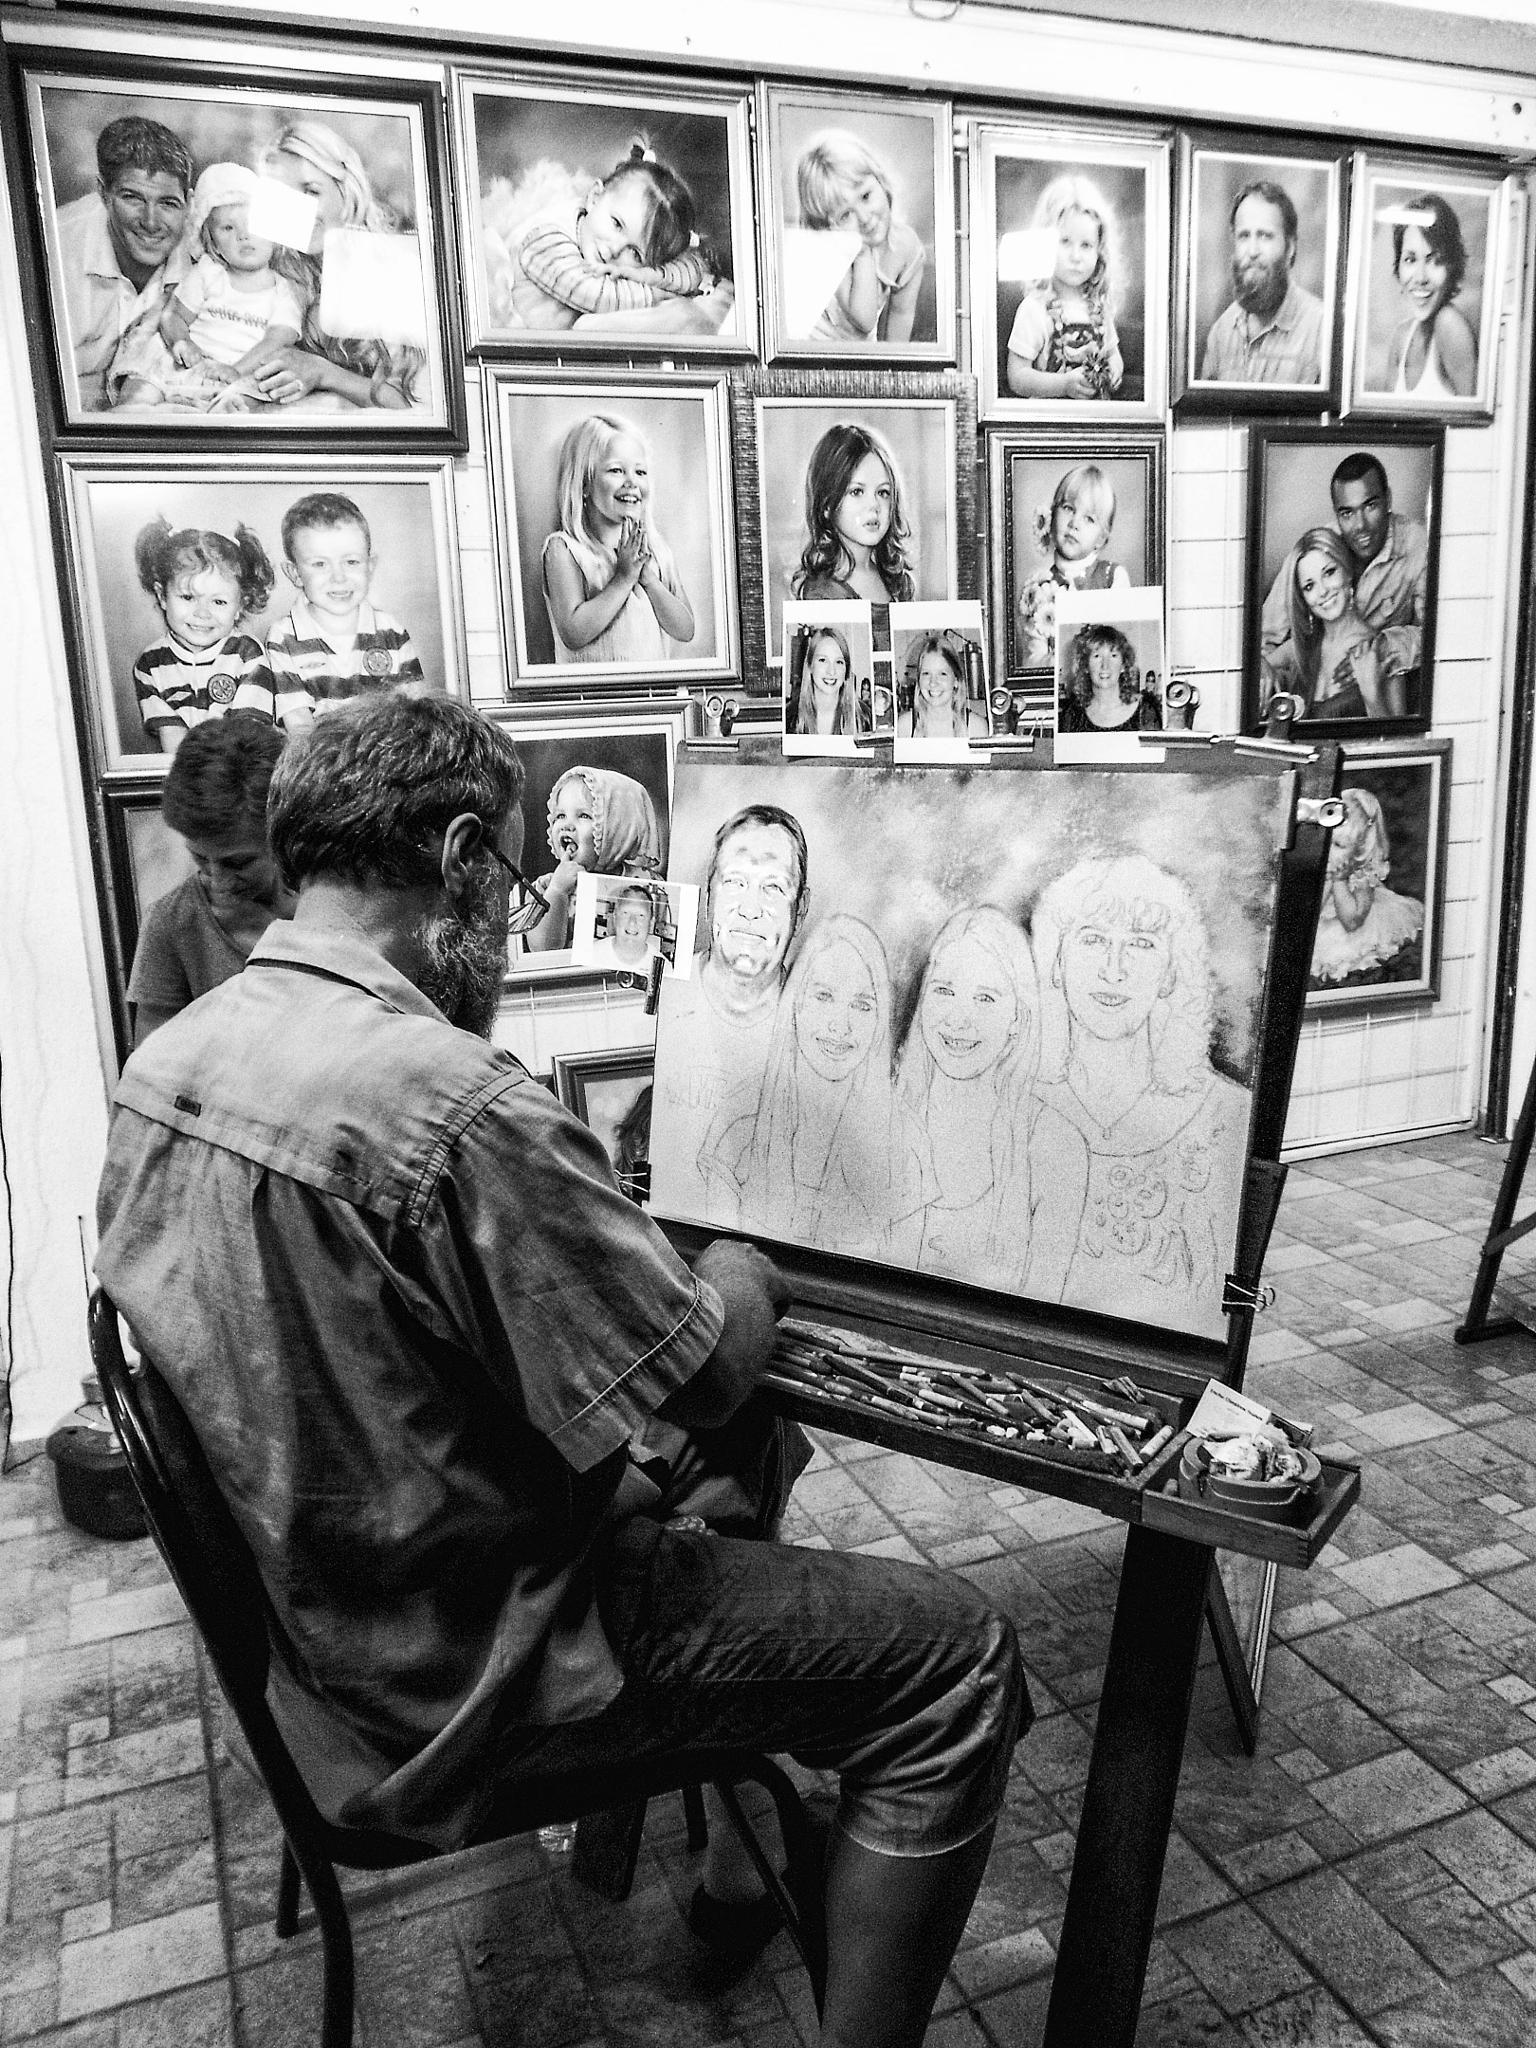 The artist by mariq.kravets